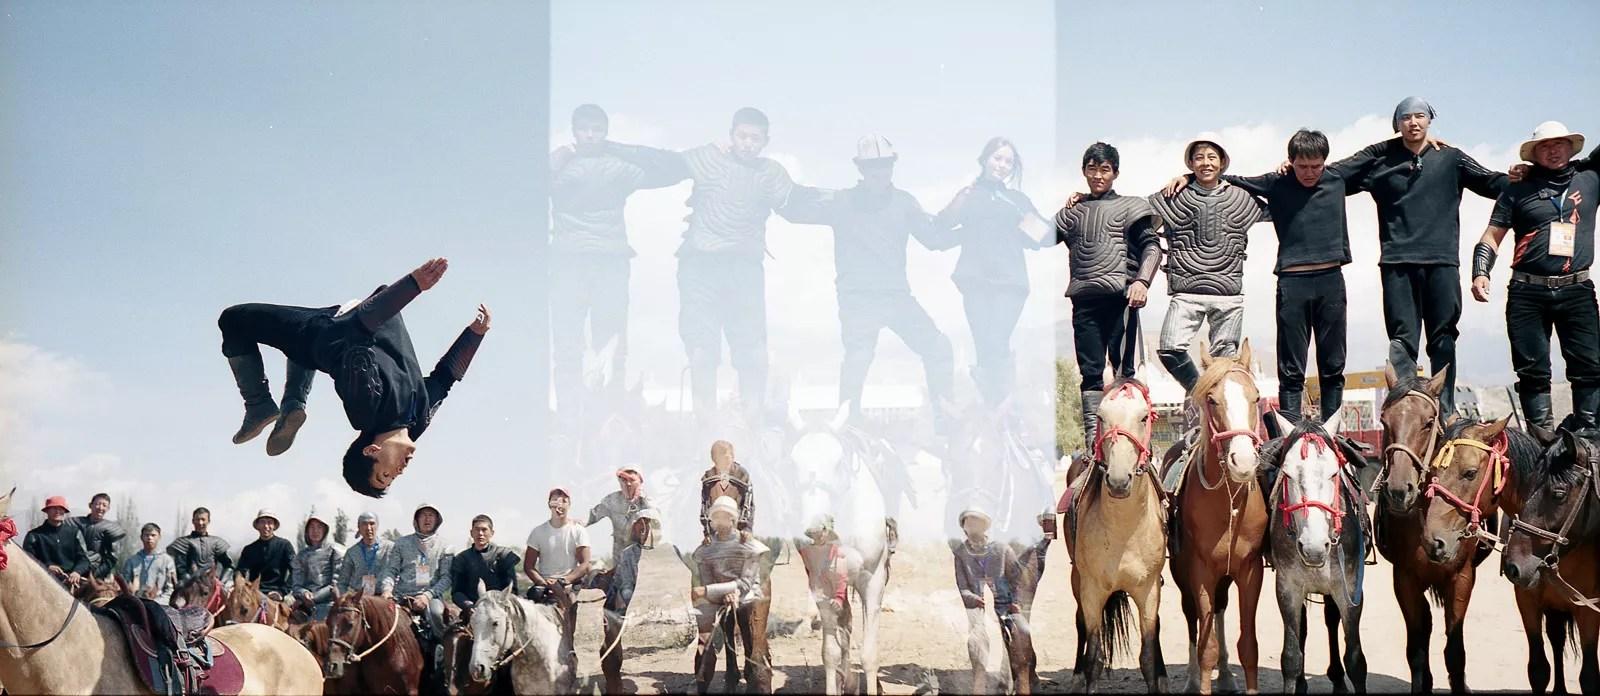 World Nomad Games Shot On 35mm Film 400 Portra Bessa R3a 40mm Voigtlander